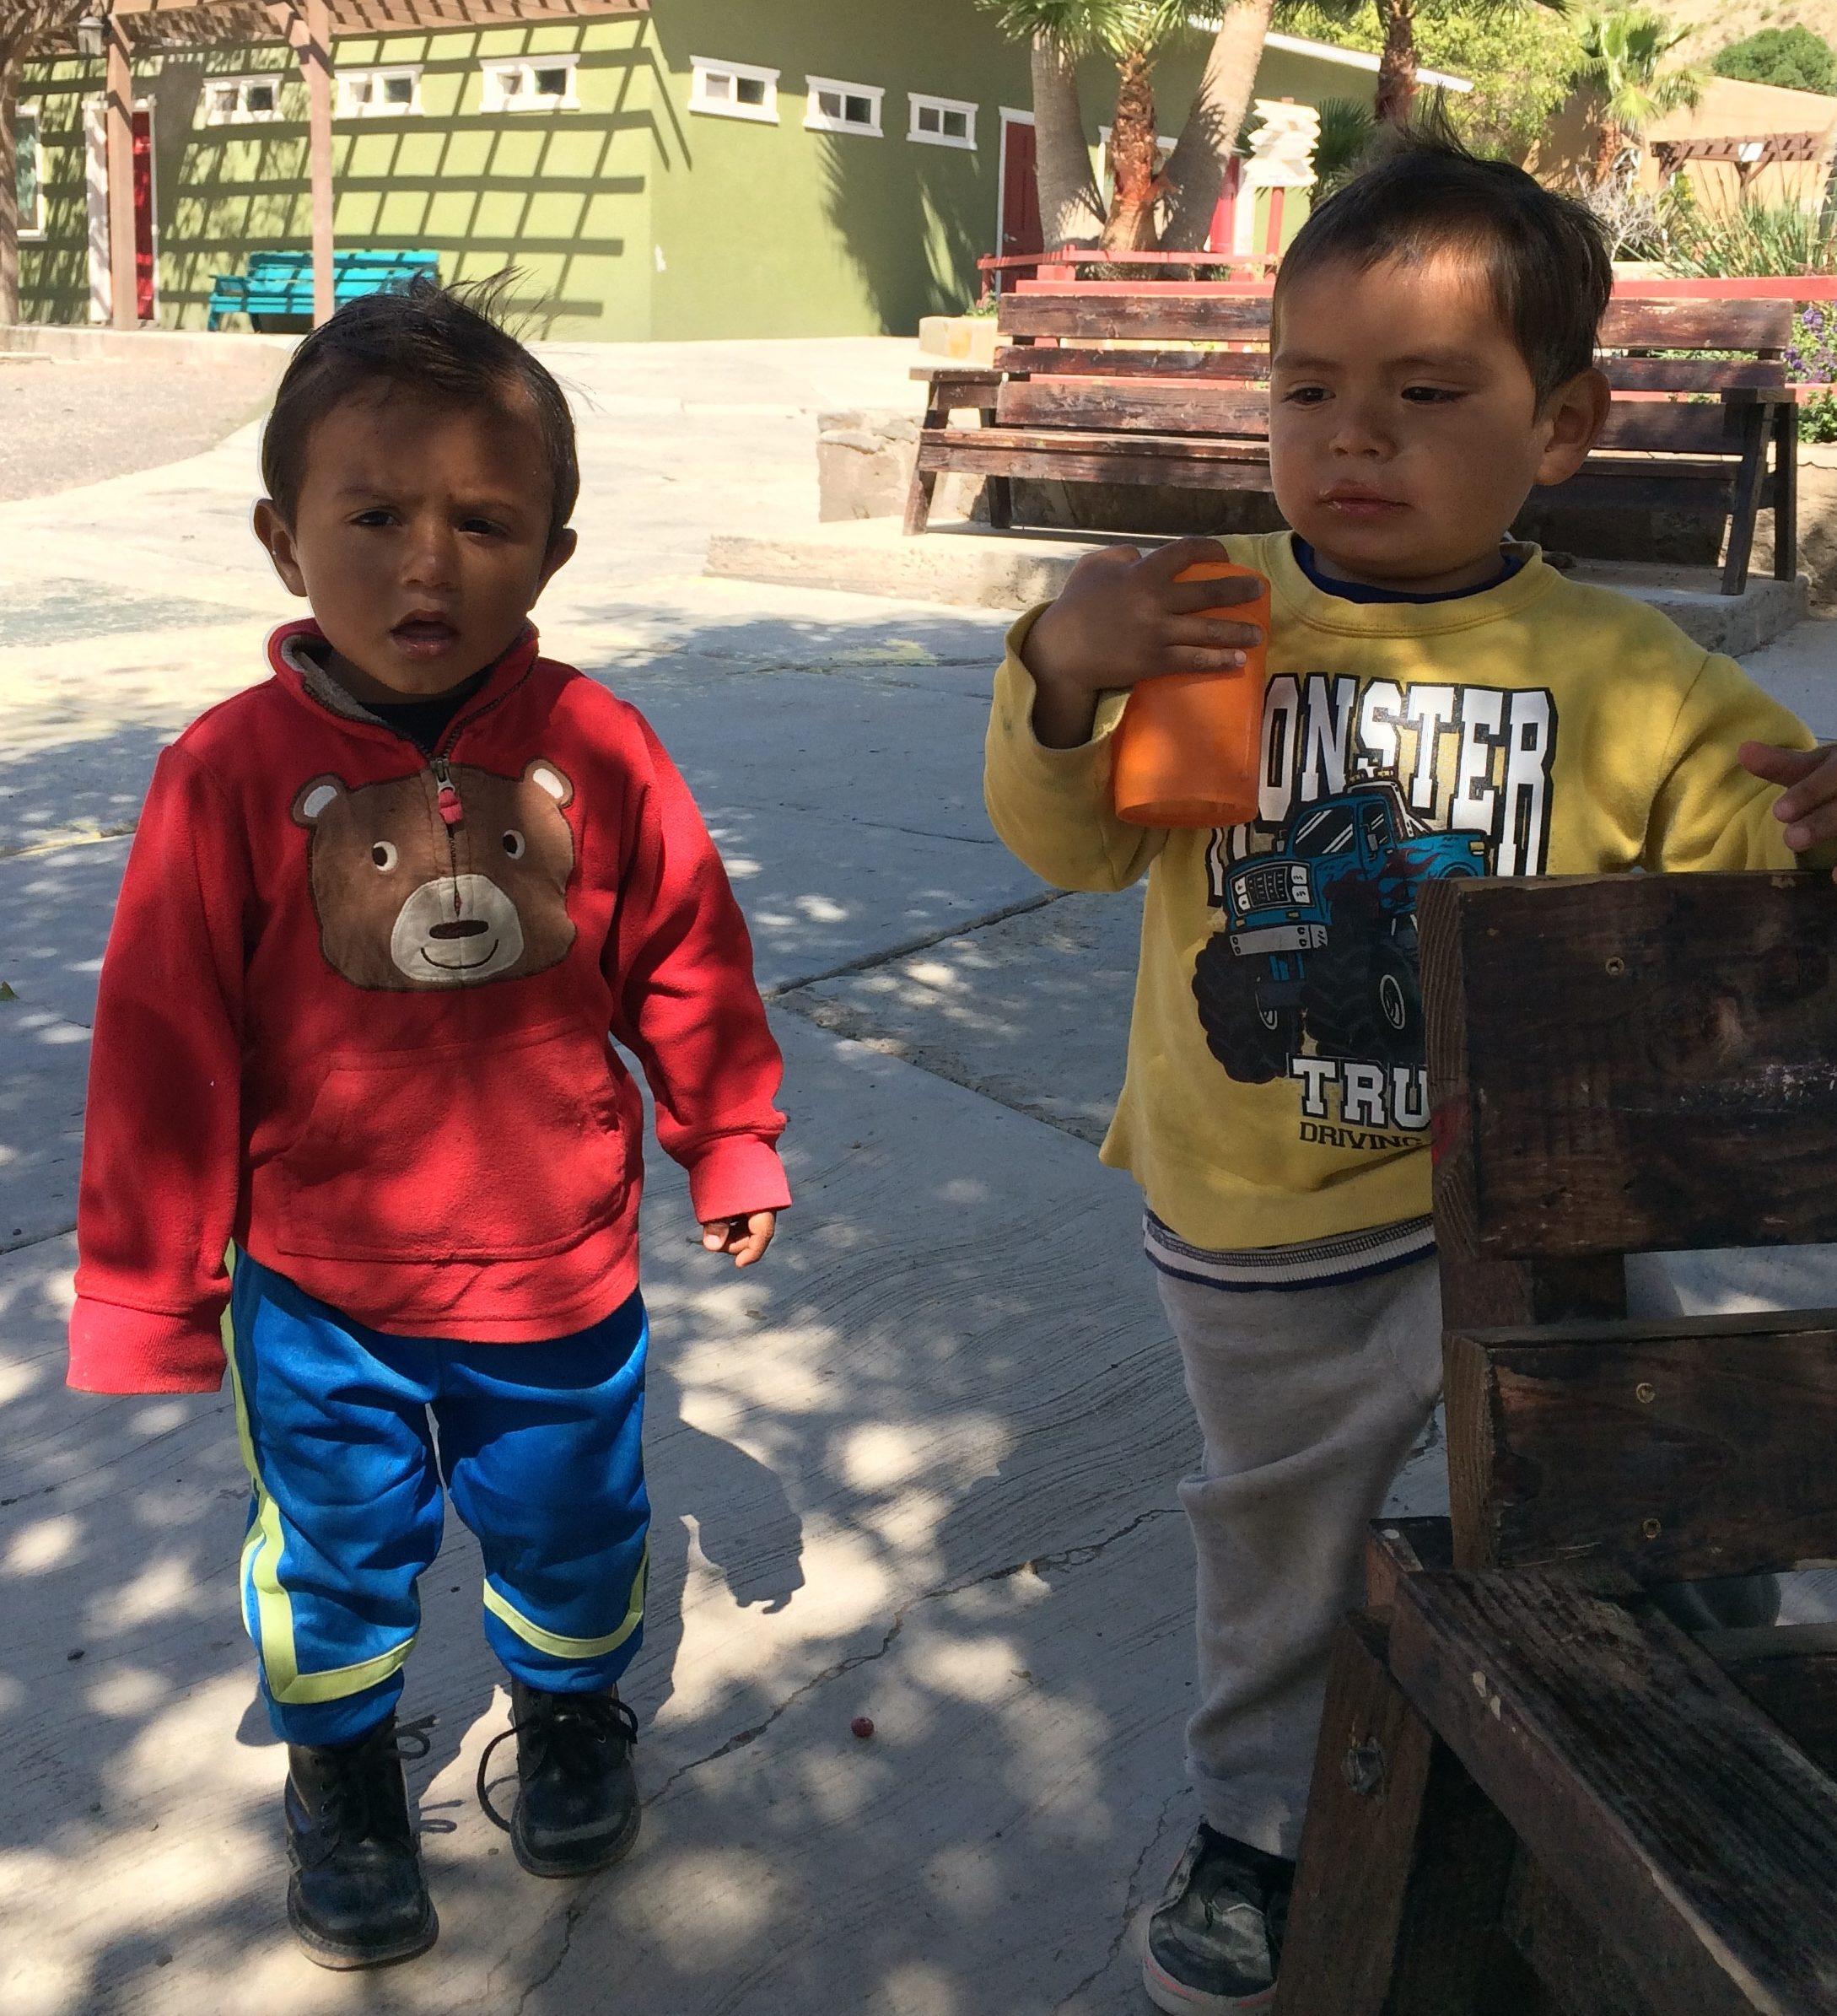 Journey to the Door of Faith Orphanage, La Mision, Baja, Mexico